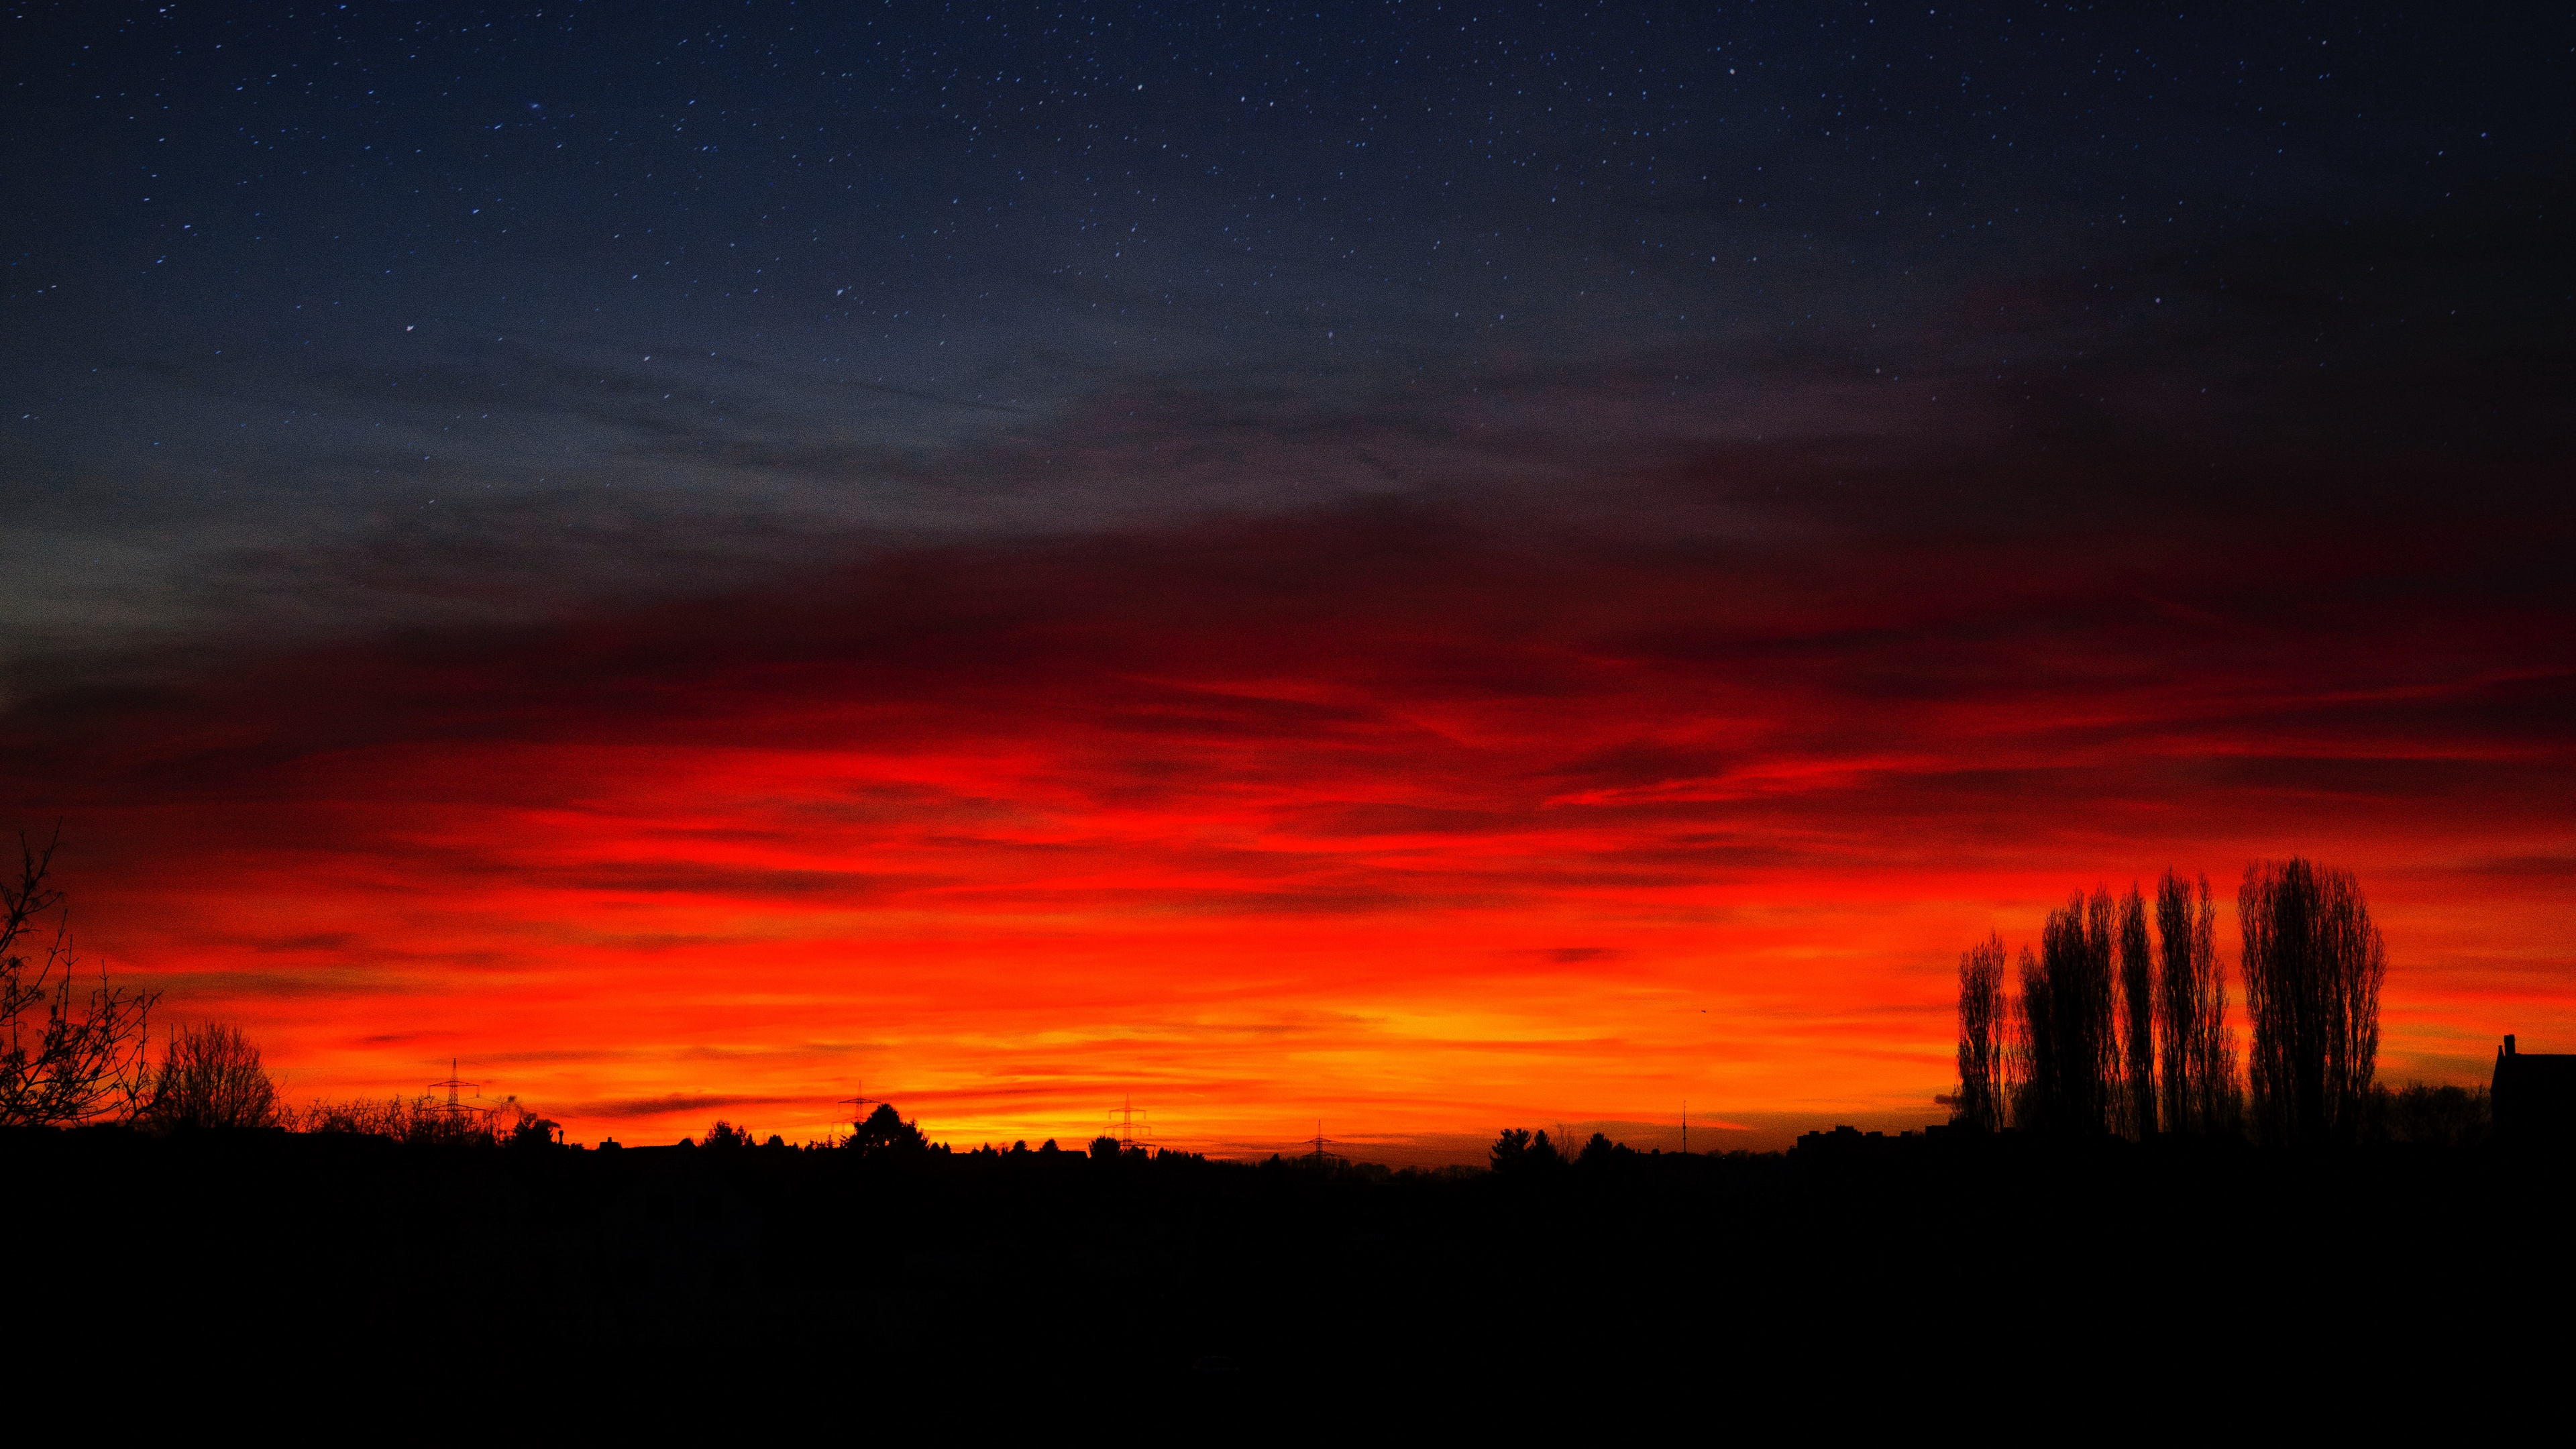 sunset horizon night starry sky mainz germany 4k 1540575299 - sunset, horizon, night, starry sky, mainz, germany 4k - sunset, Night, Horizon